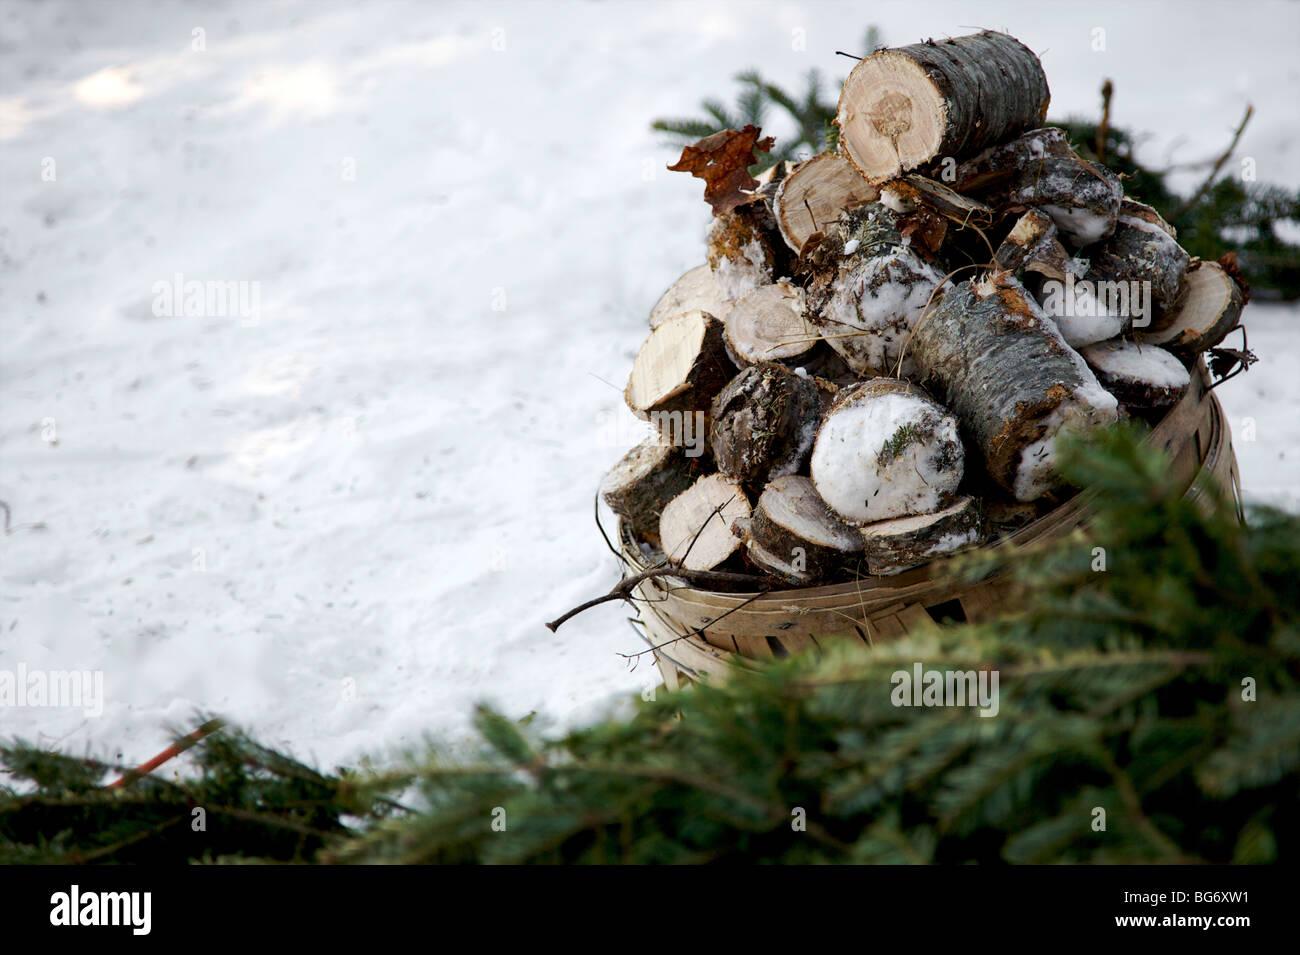 a basket full of cut tree stumps - Stock Image